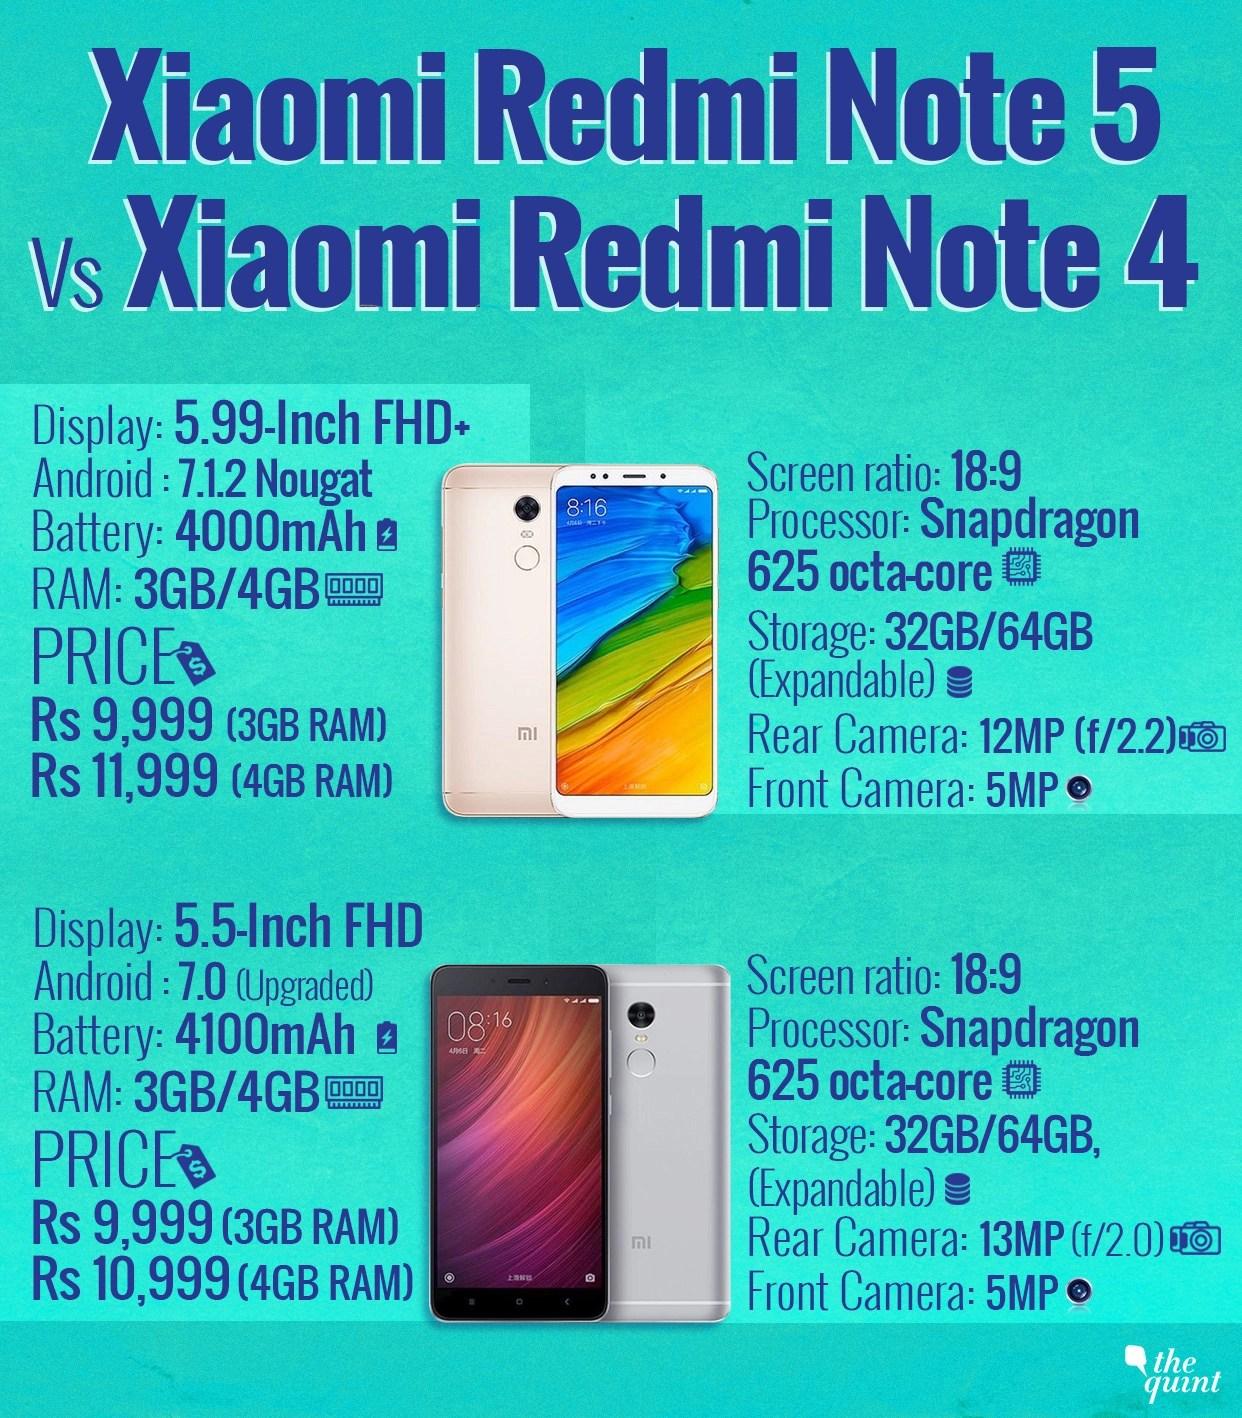 Redmi Note 5 versus Redmi Note 4: What's different?